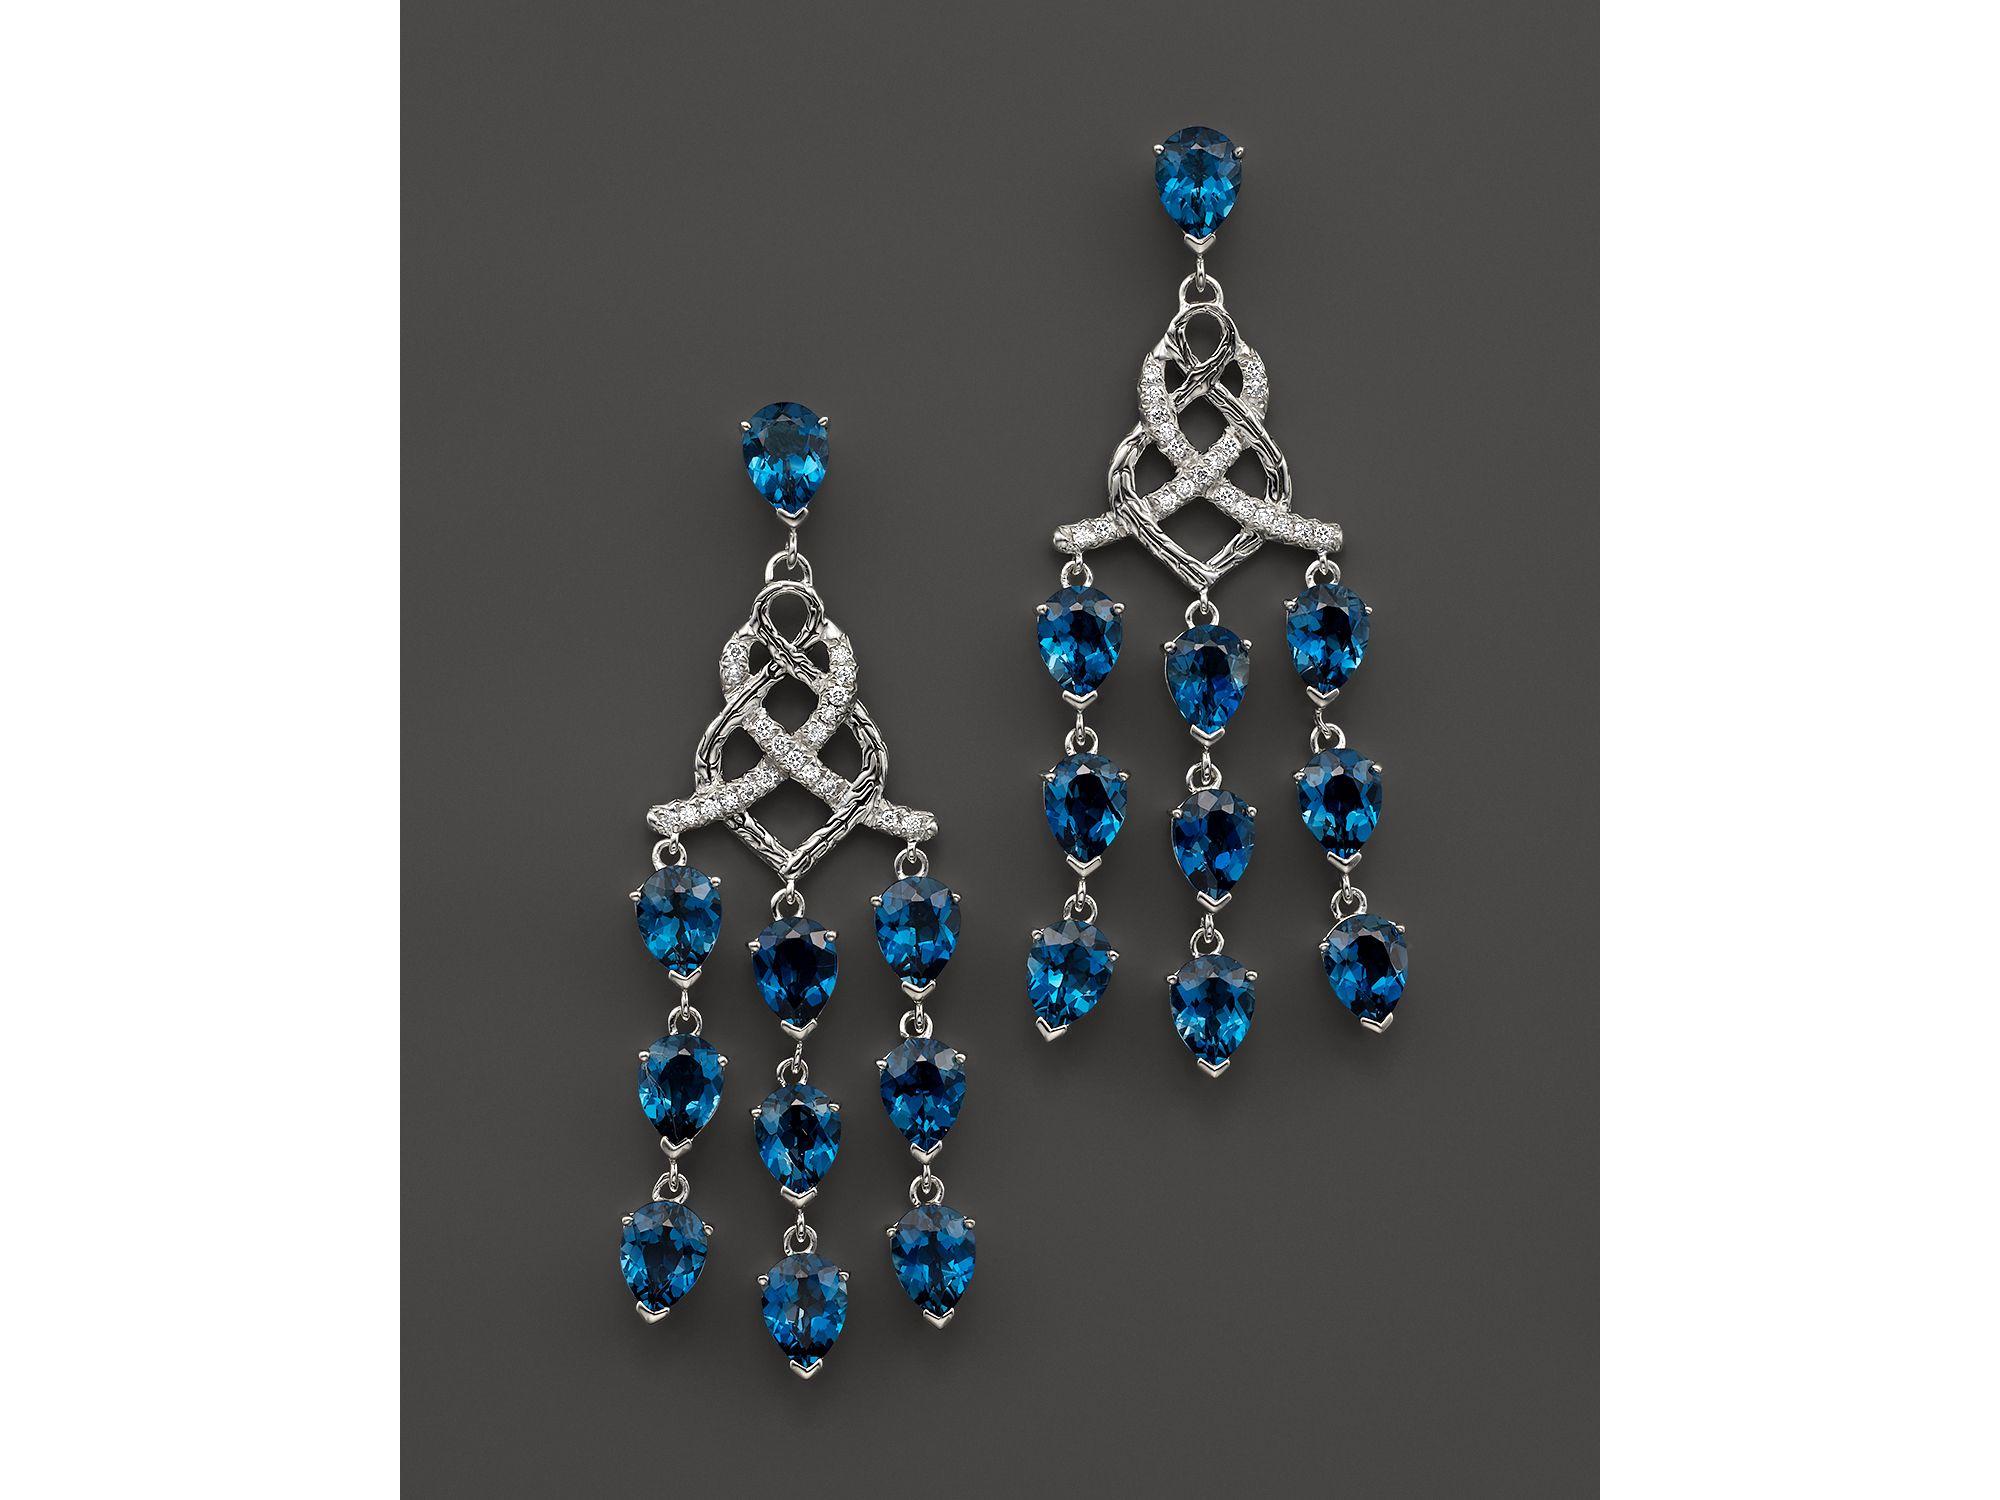 John hardy Sterling Silver Classic Chain Chandelier Earrings With